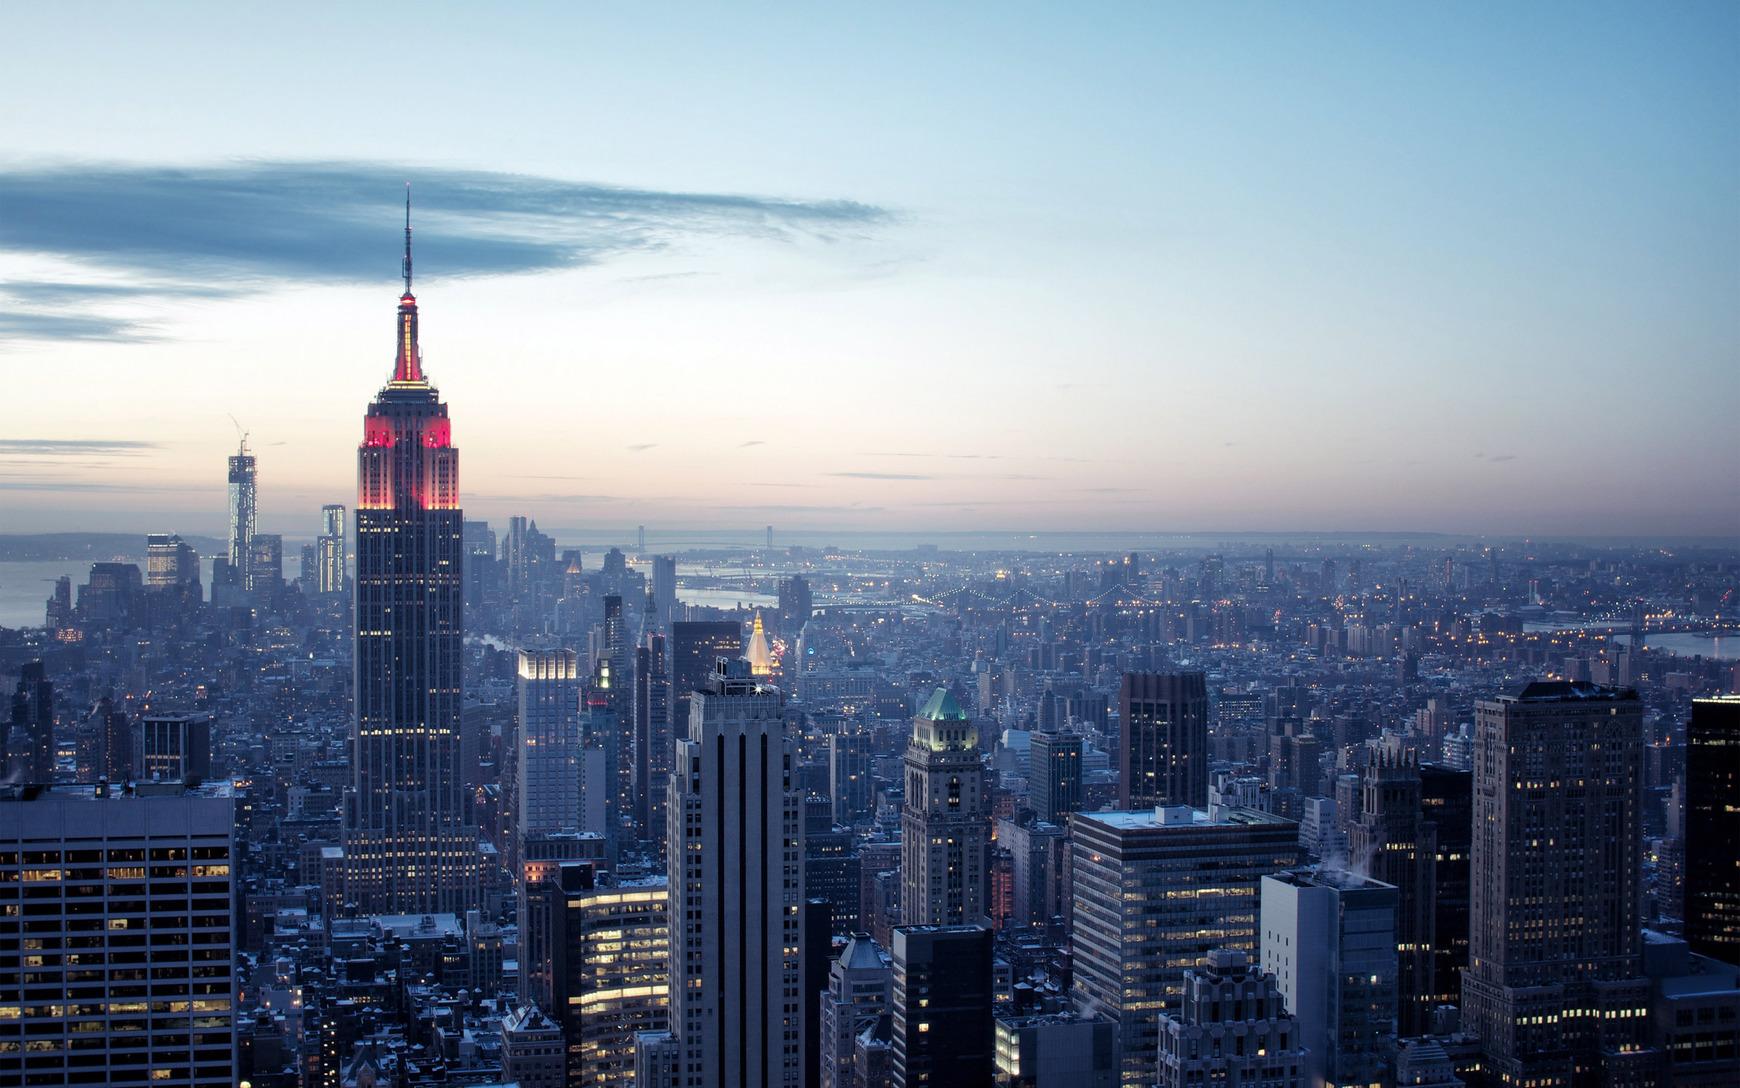 best new york city wallpapers new york city wallpaperjpg 1740x1088